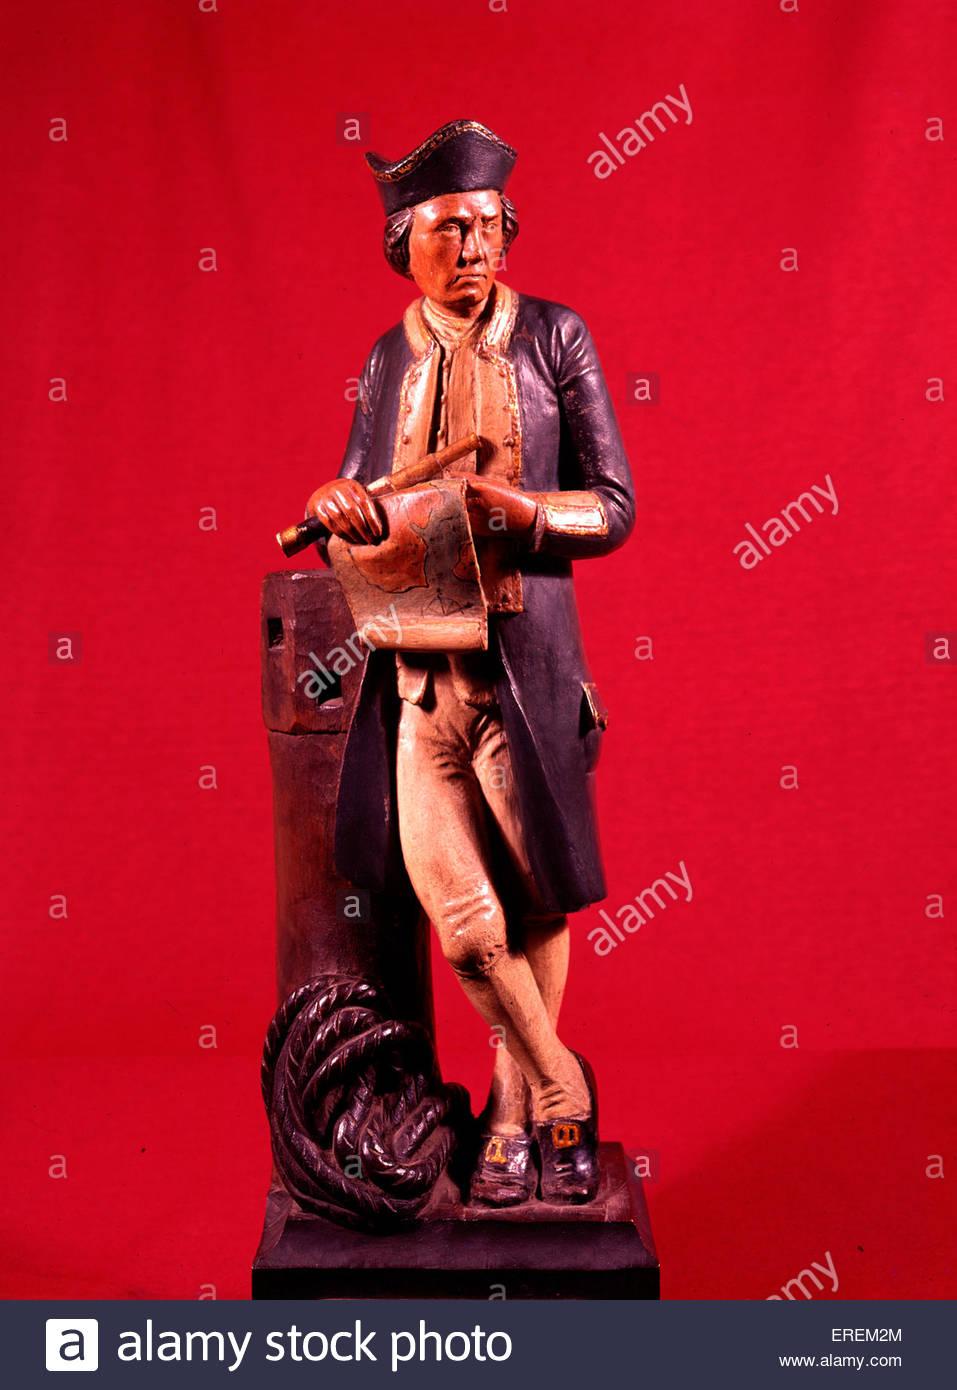 Captain Cook Statuette, Barking Abbey, Essex, UK. Painted wood. Captain James Cook ( 1728 – 1779), British explorer, - Stock Image